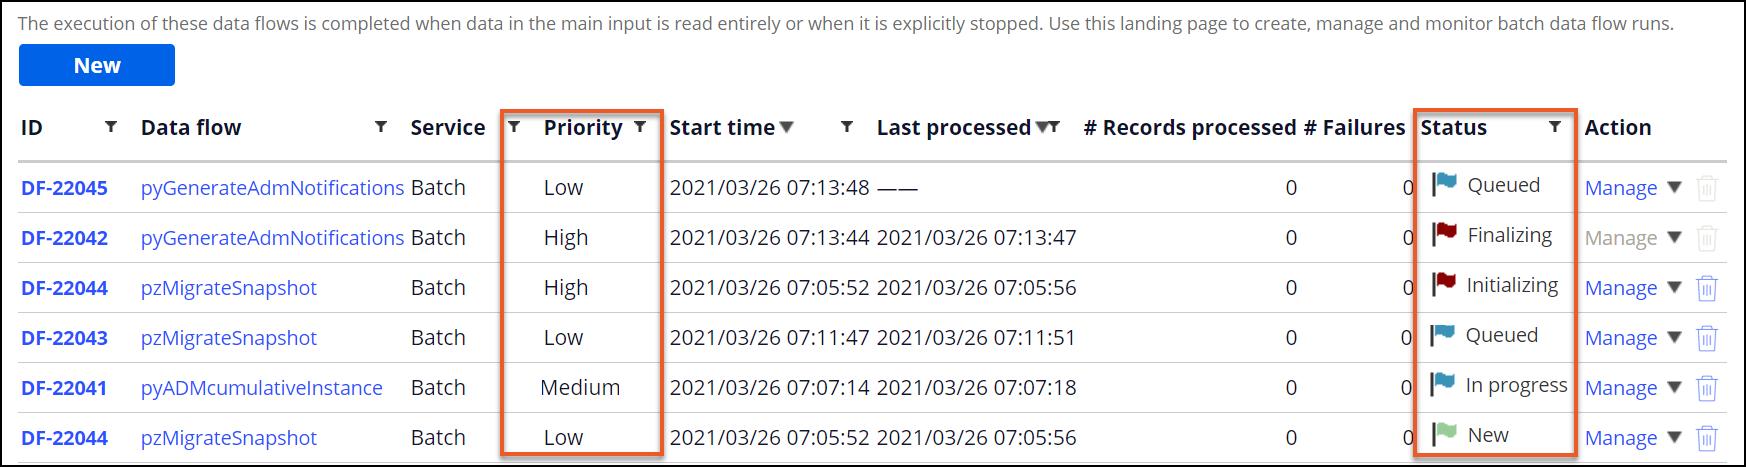 DSM-prioritizing-data-flow-runs icon